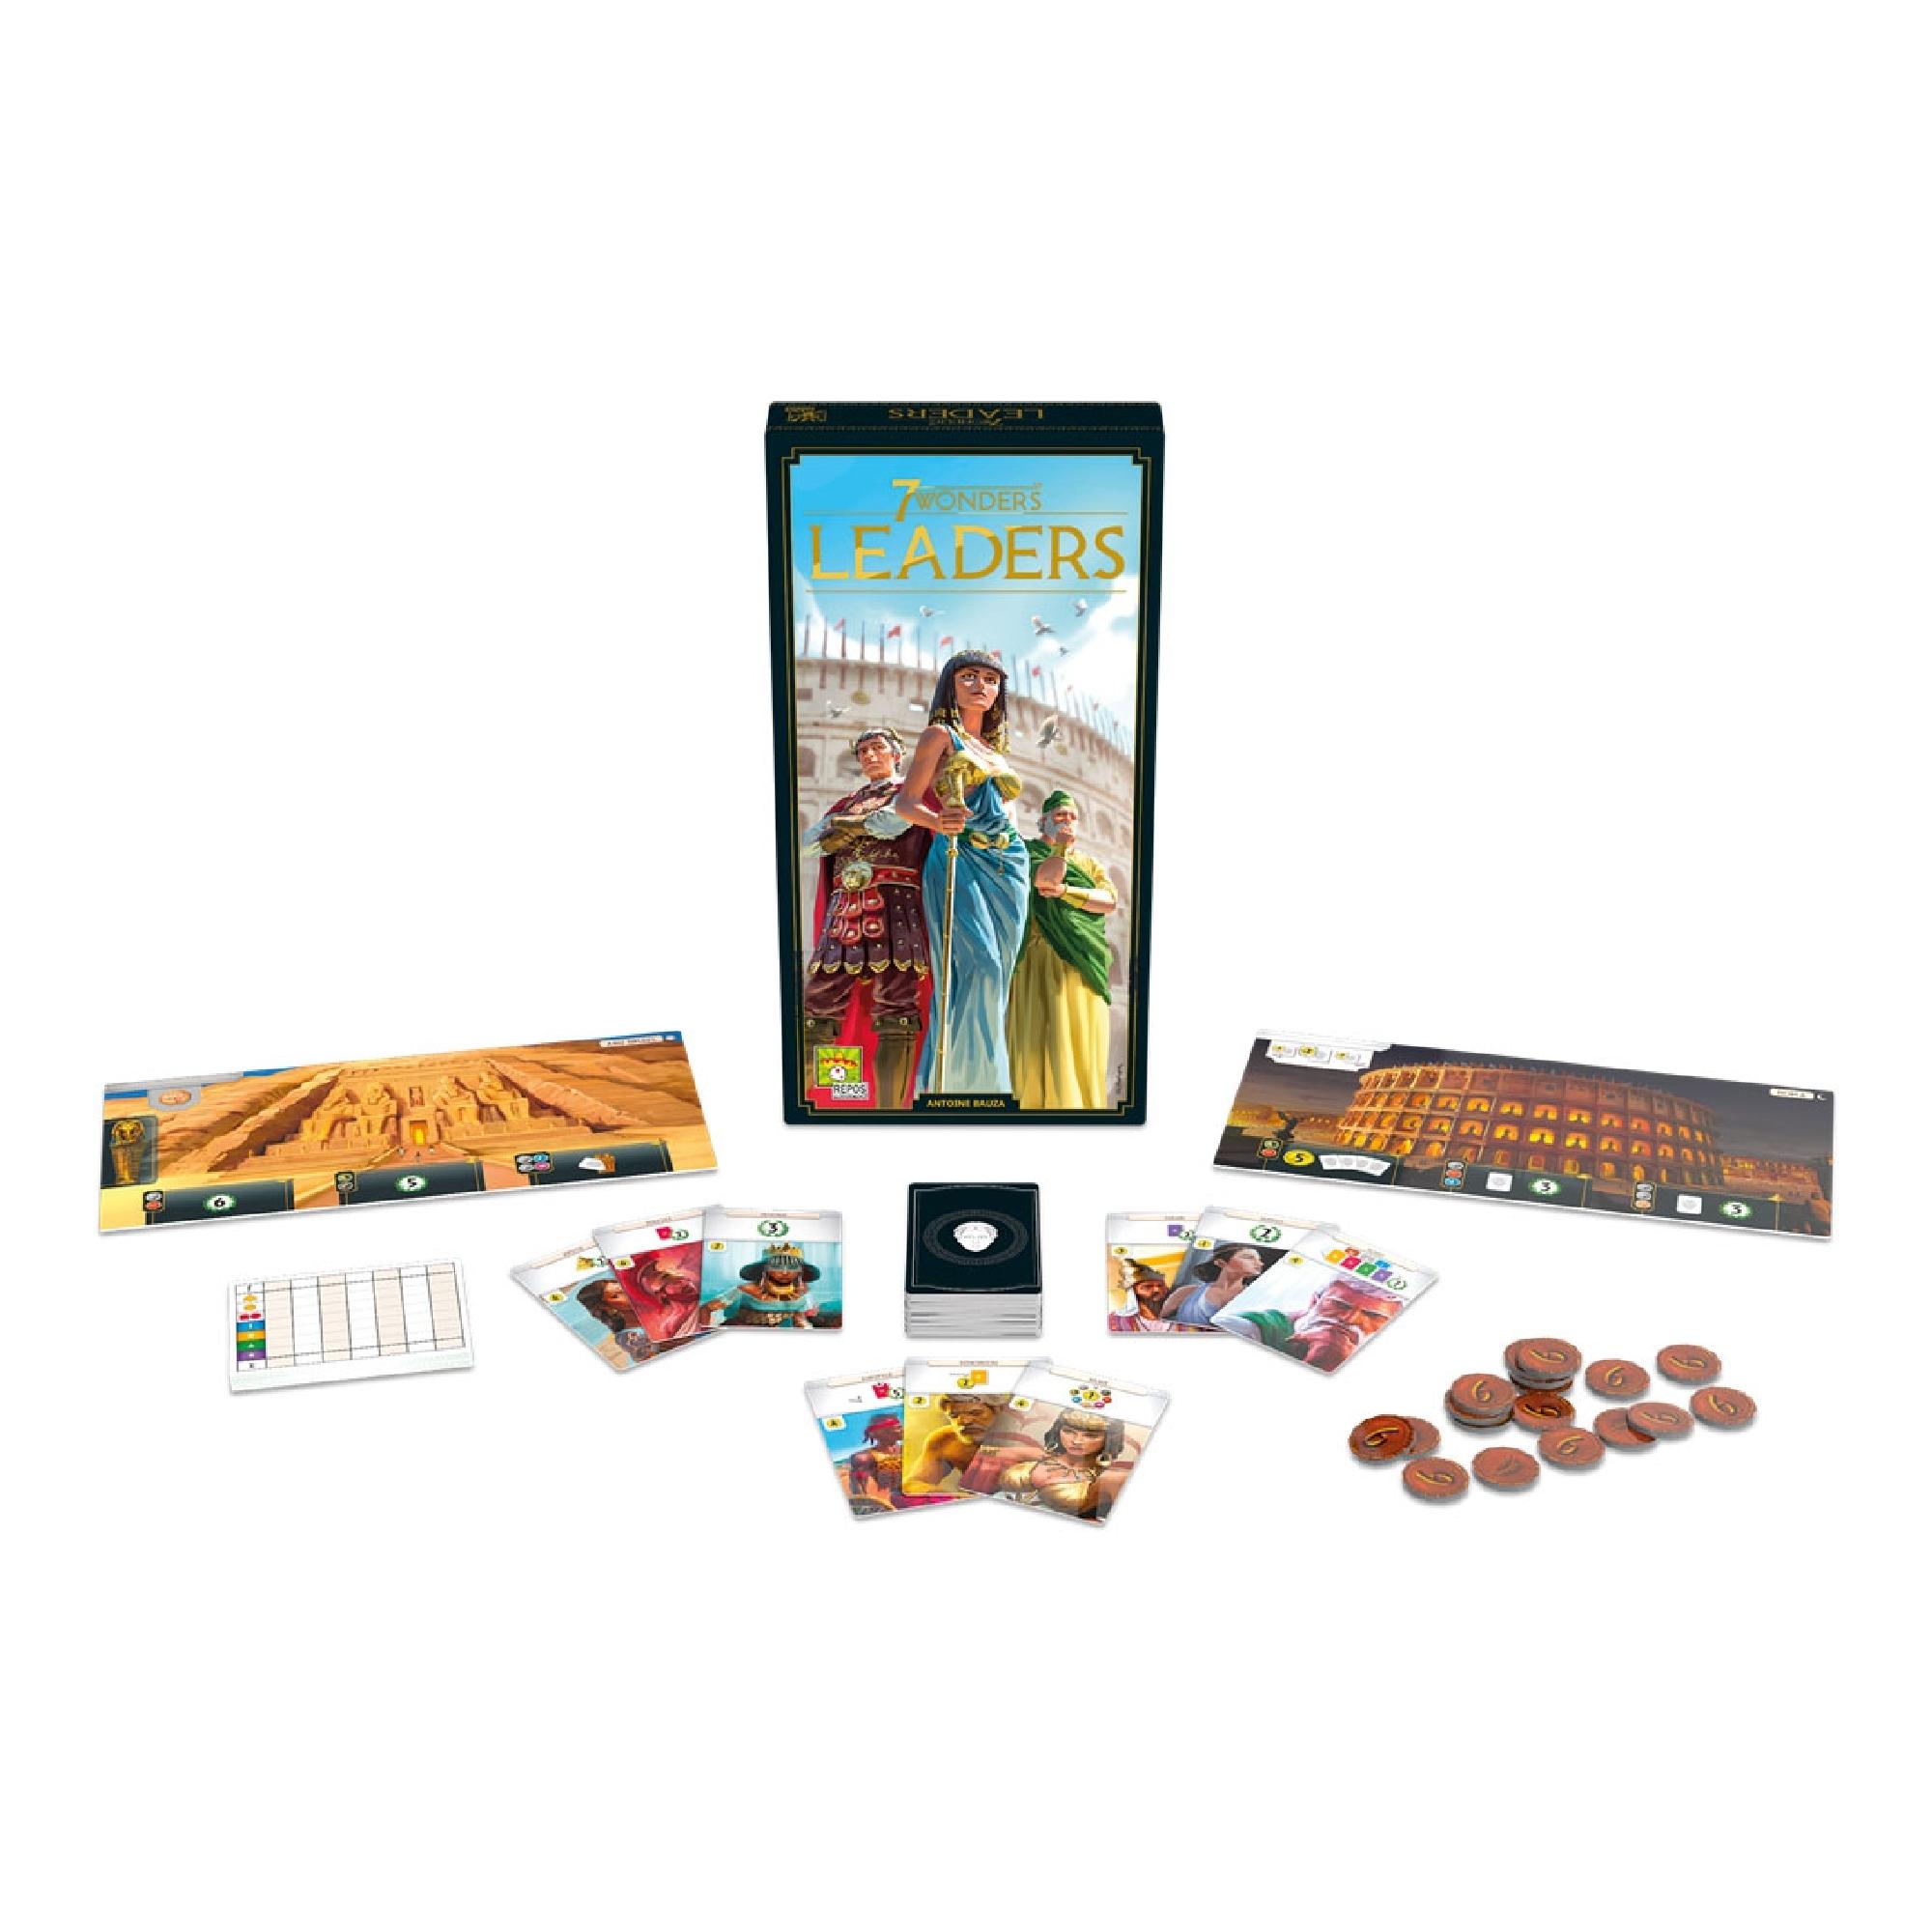 Repos Production 7 Wonders, New Edition, Leaders VA